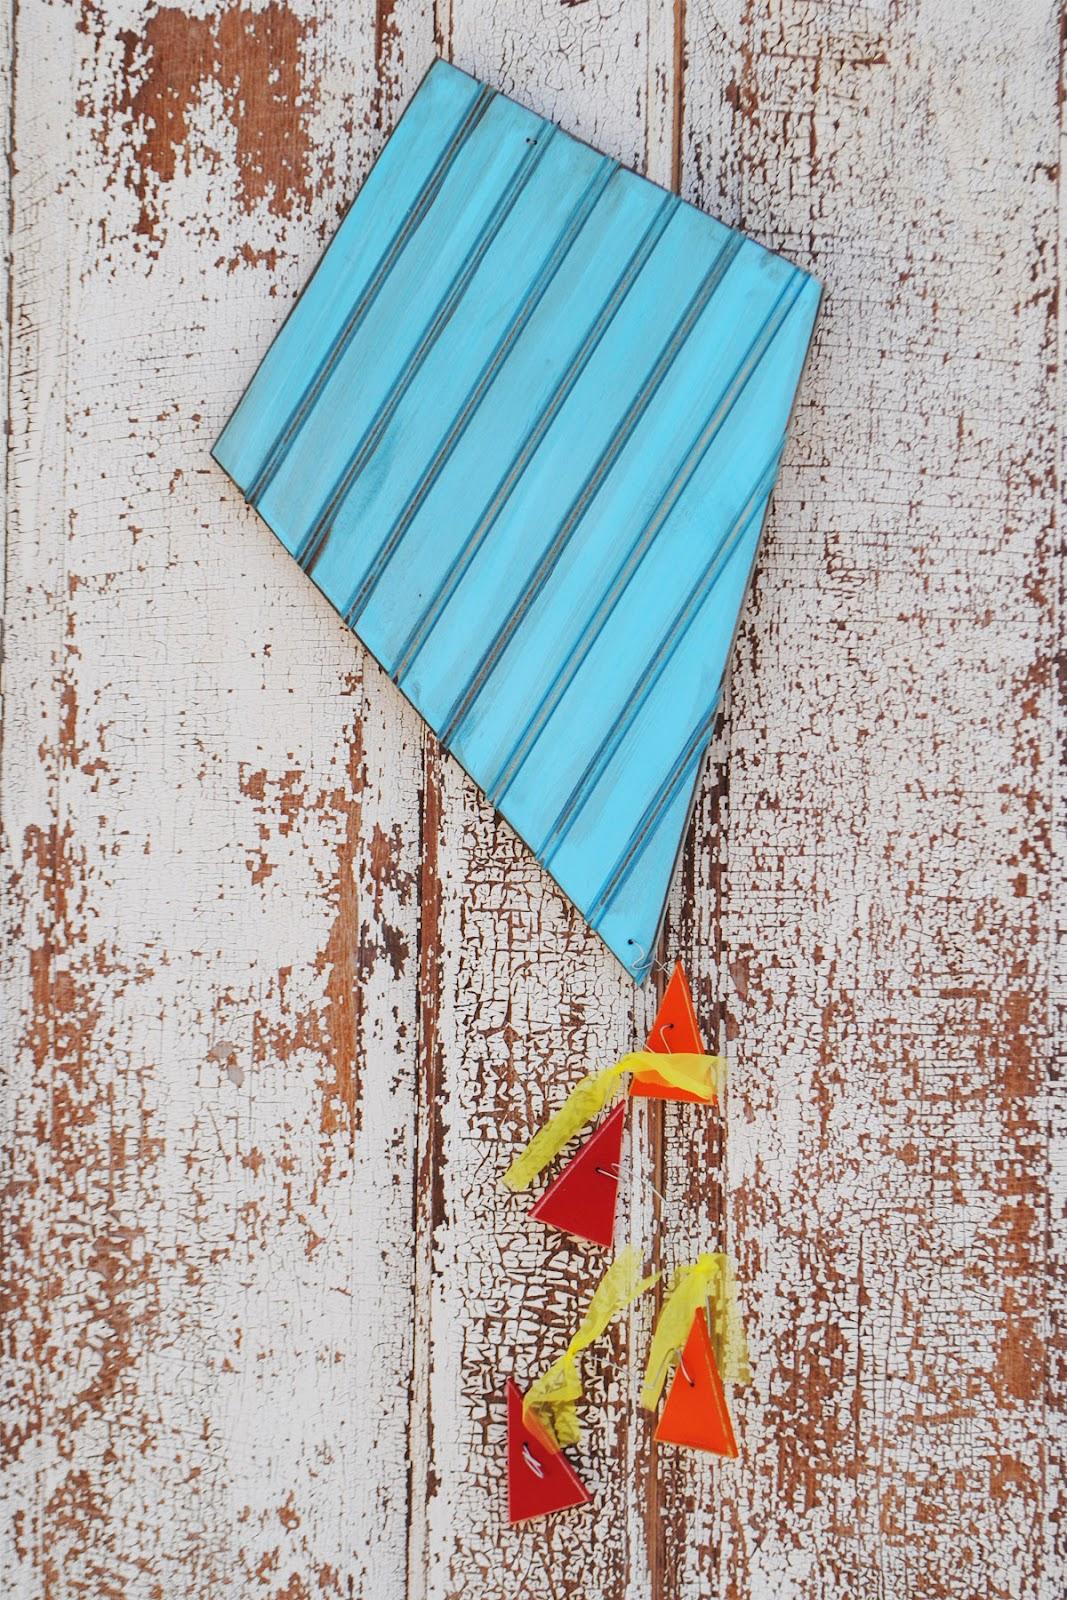 Dream it diy kite kit for Decoration kite